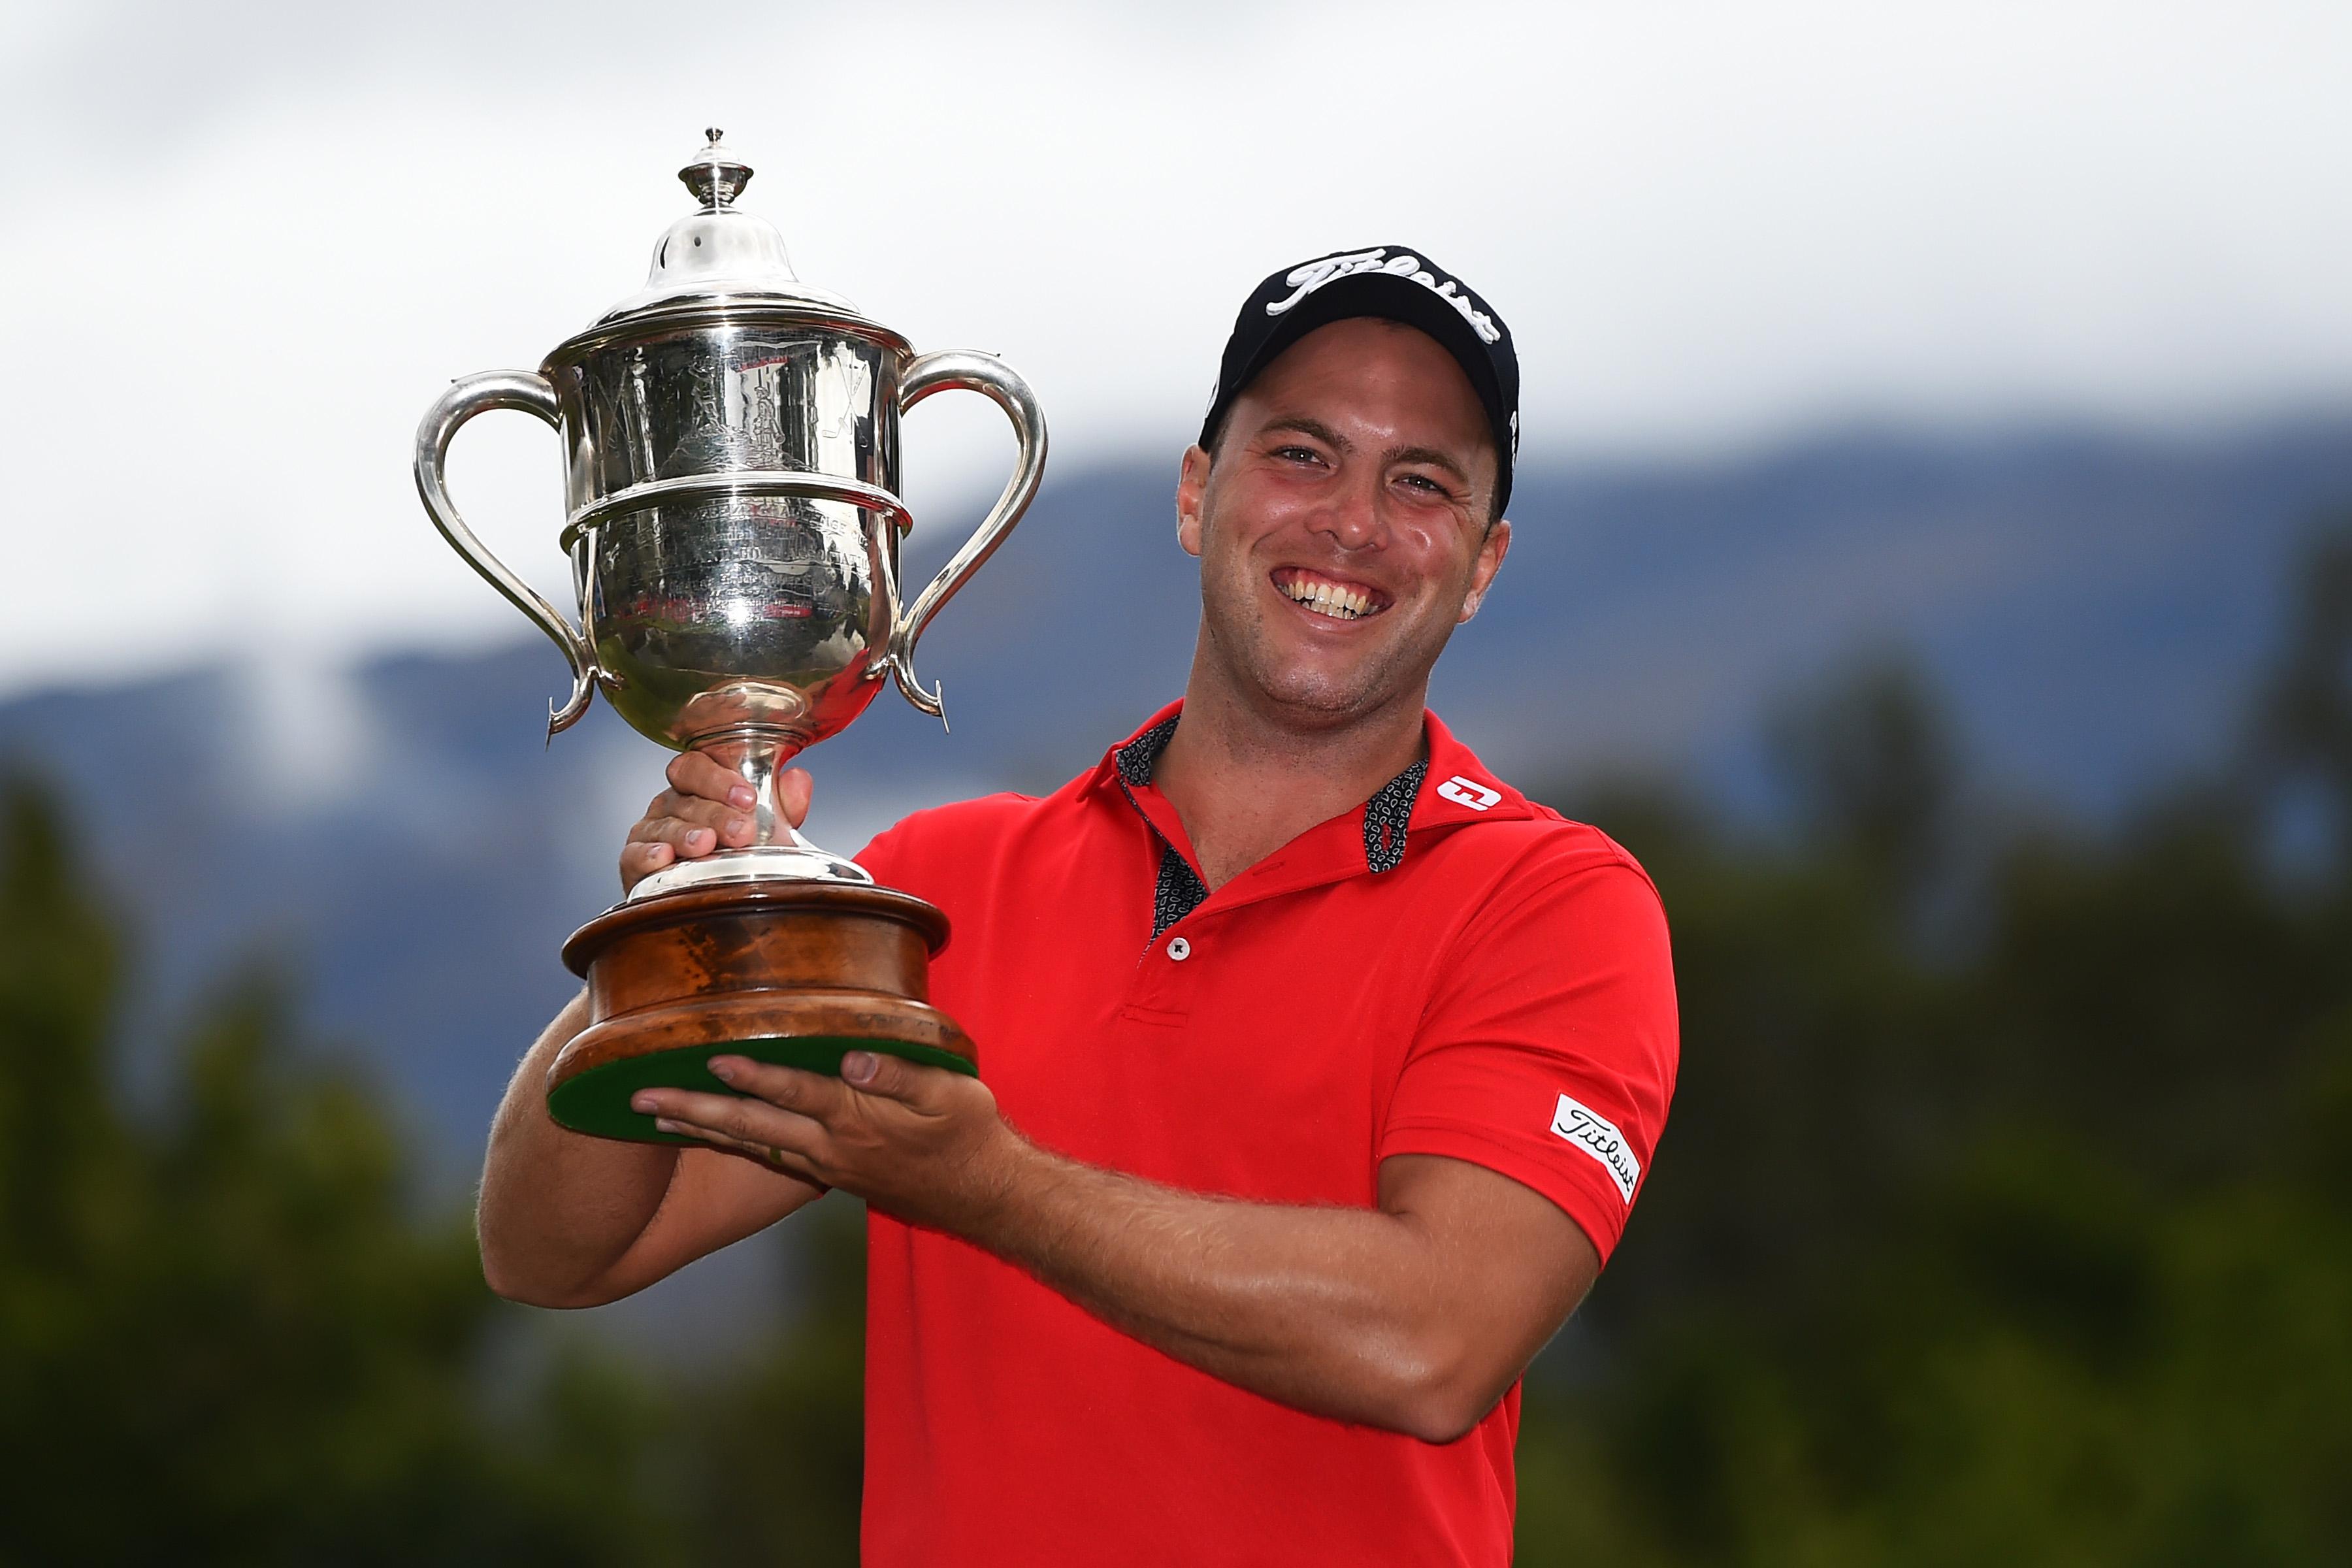 2018 ISPS Handa New Zealand Open Round 4